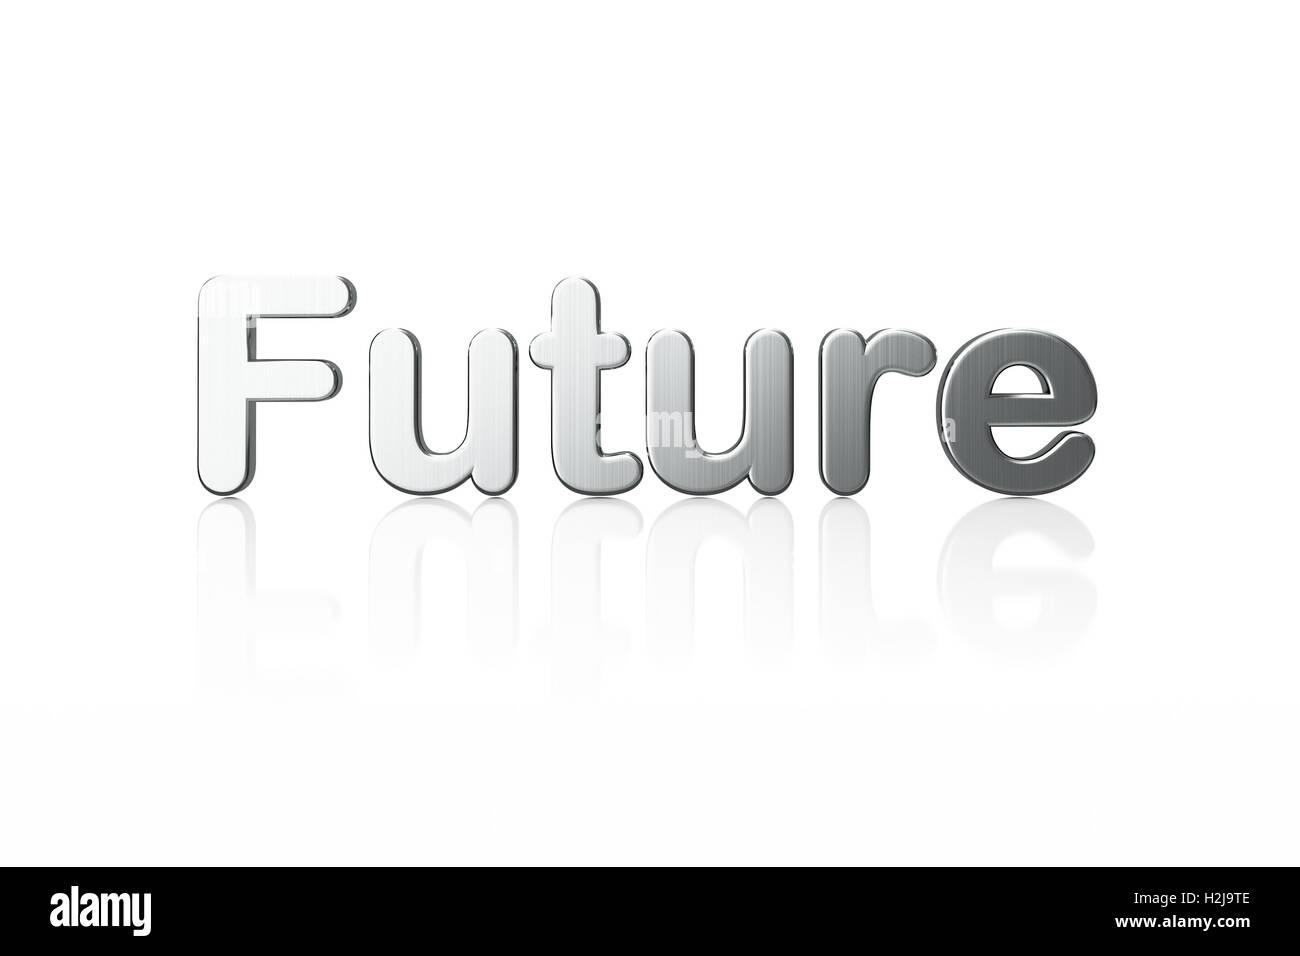 Timeline concept: 3d word Future Stock Photo: 122104766 - Alamy